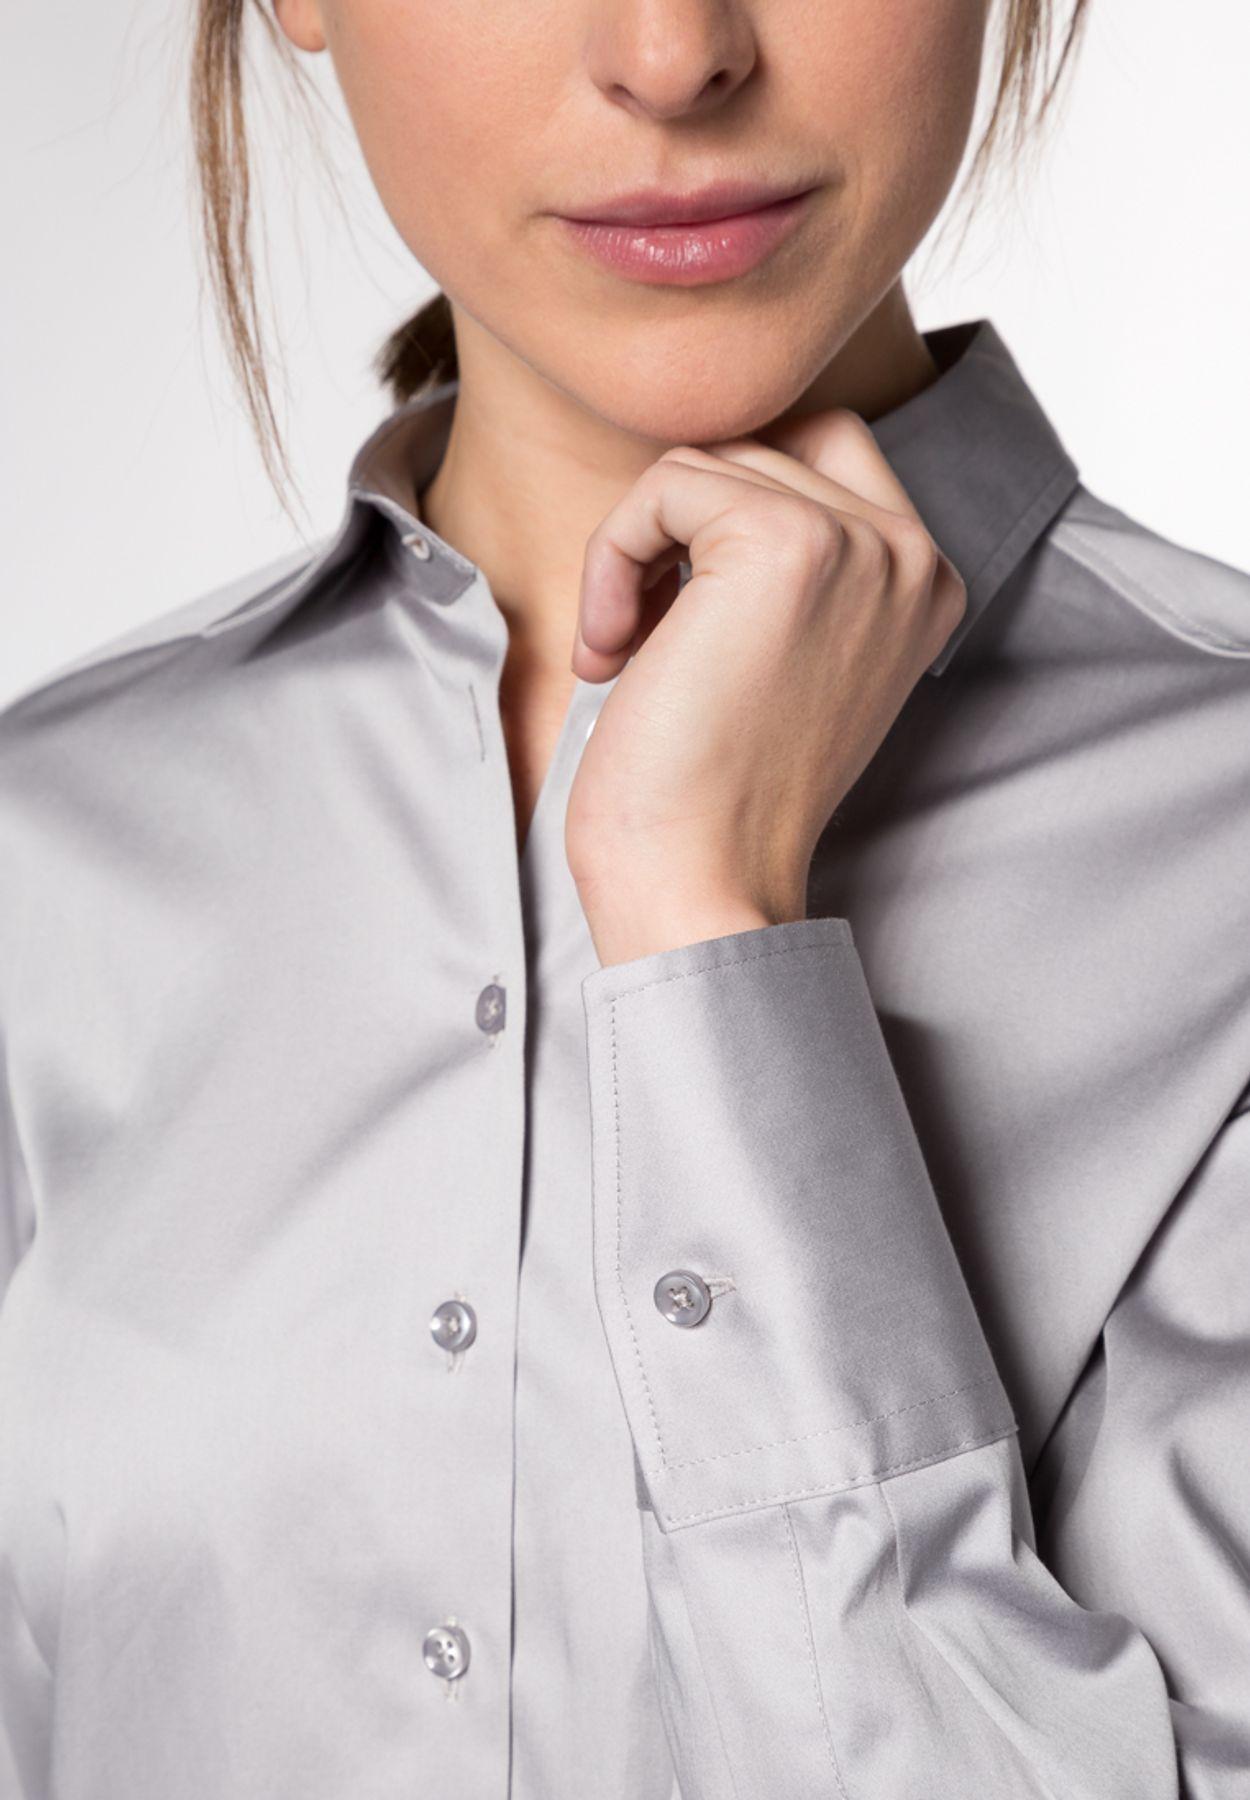 Eterna - Comfort Fit - Damen Langarm Bluse Modern Classic Stretch in versch. Farben (5352 D708) – Bild 12